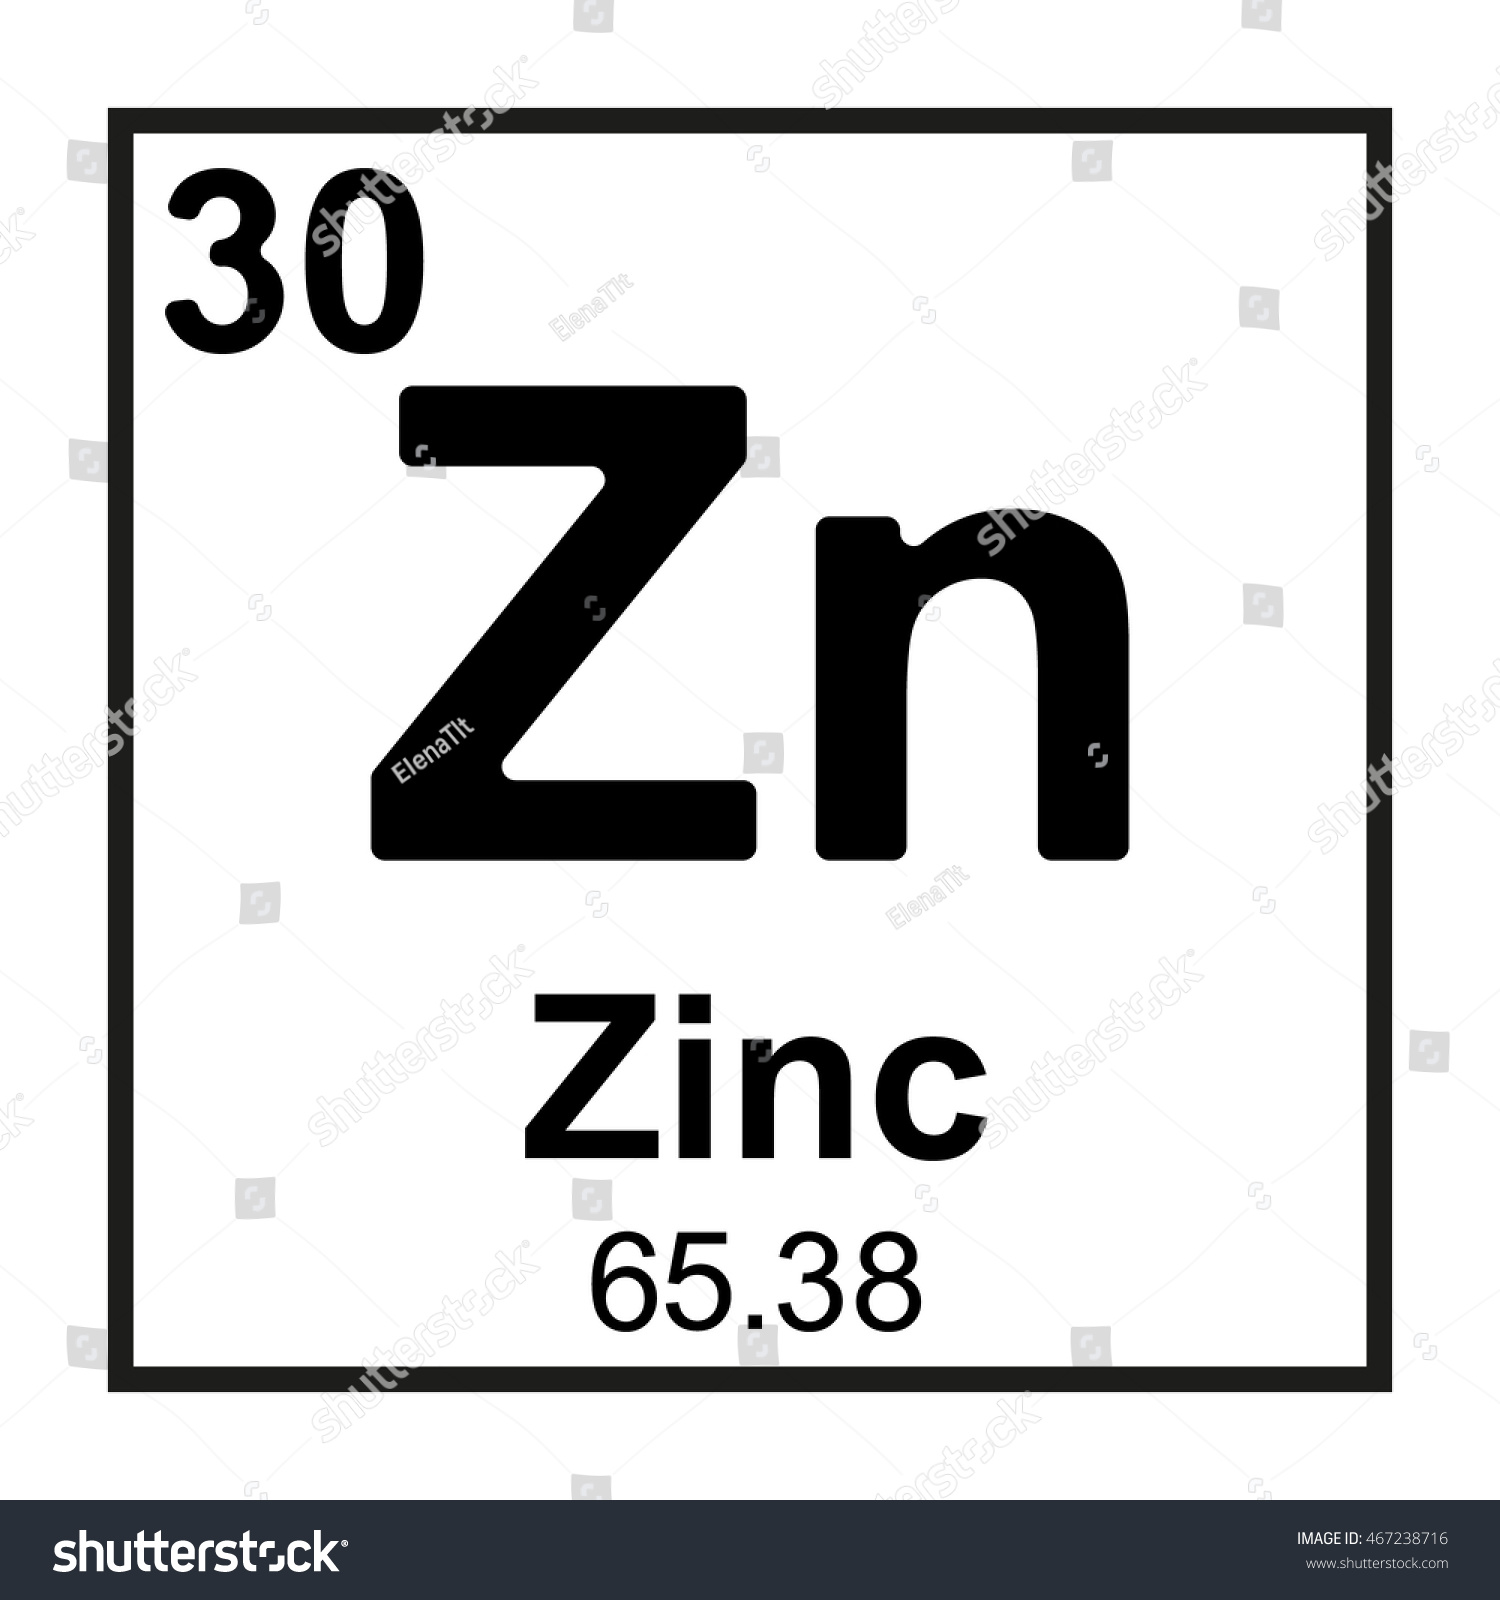 Periodic table element zinc stock vector 467238716 shutterstock periodic table element zinc gamestrikefo Gallery